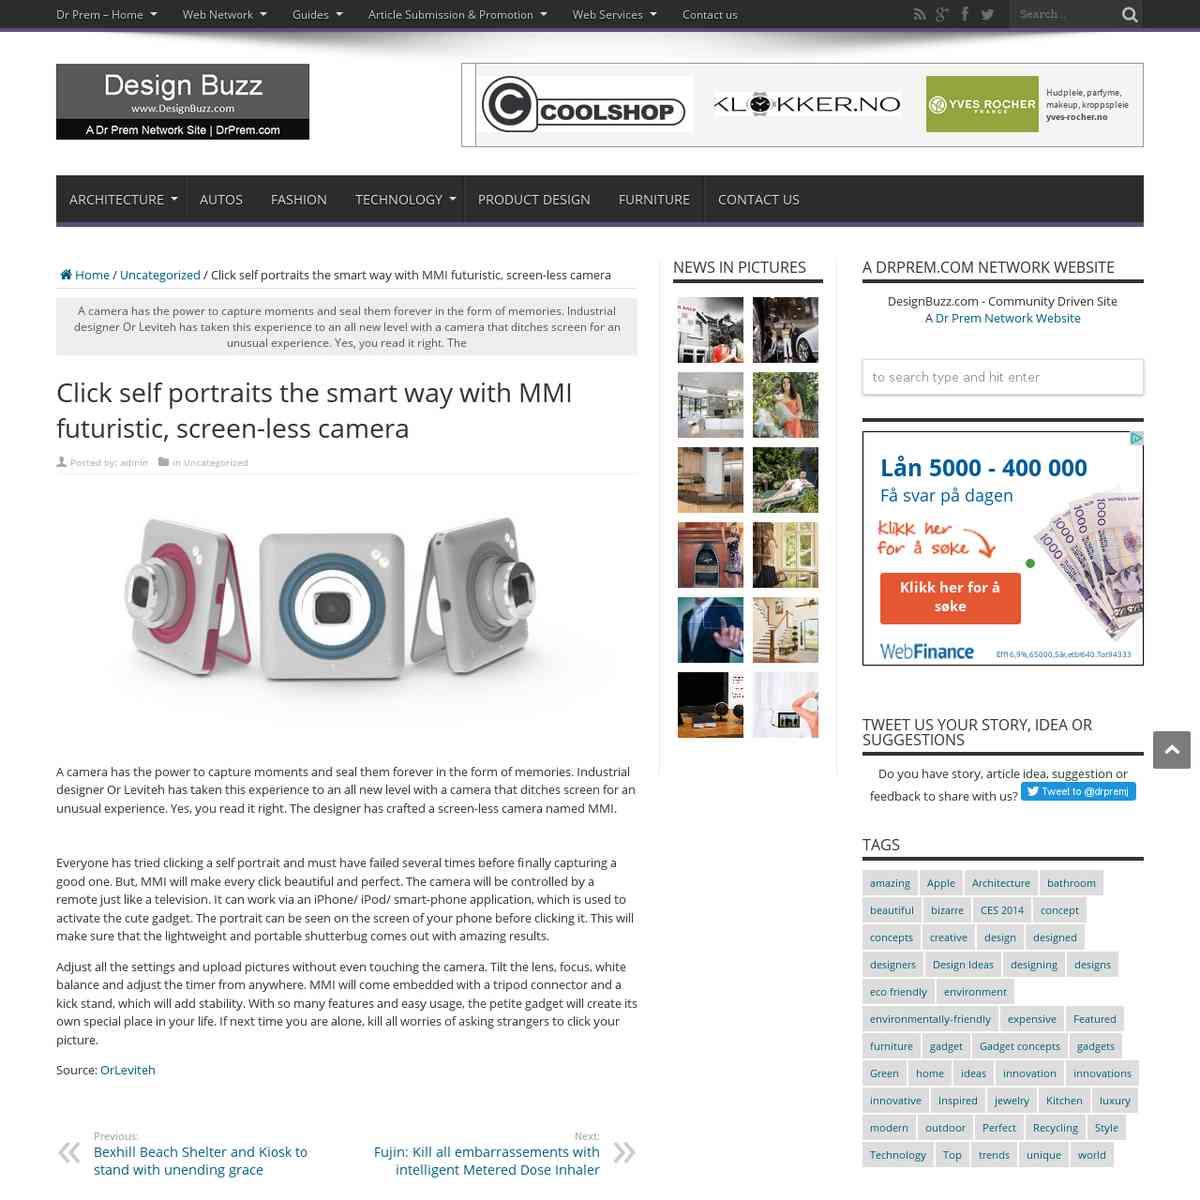 designbuzz.com/click-portraits-smart-mmi-futuristic-screen-camera/